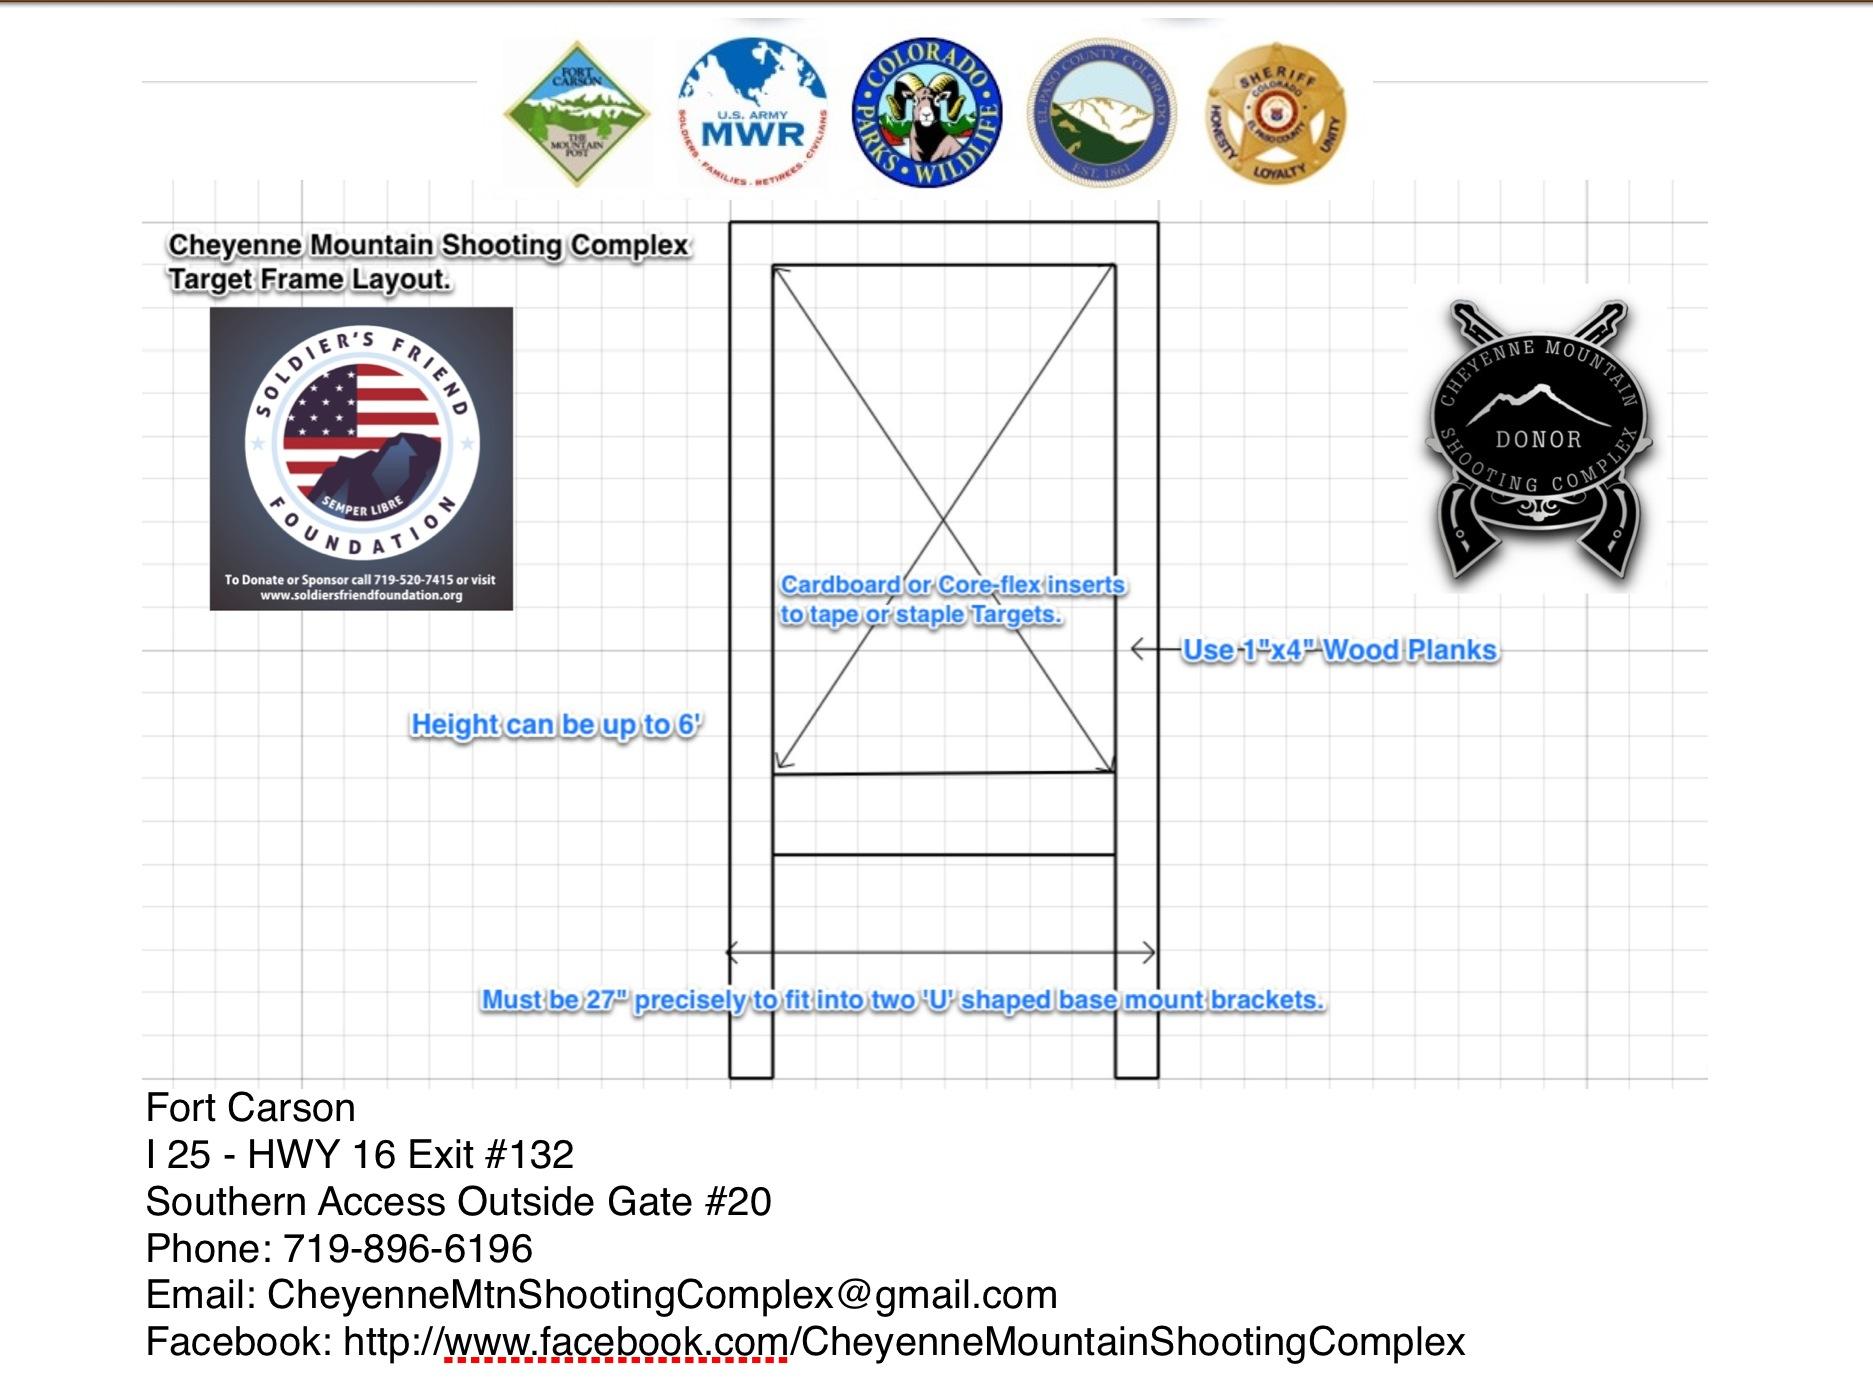 CRSN-CMSC_target_drawing.jpg